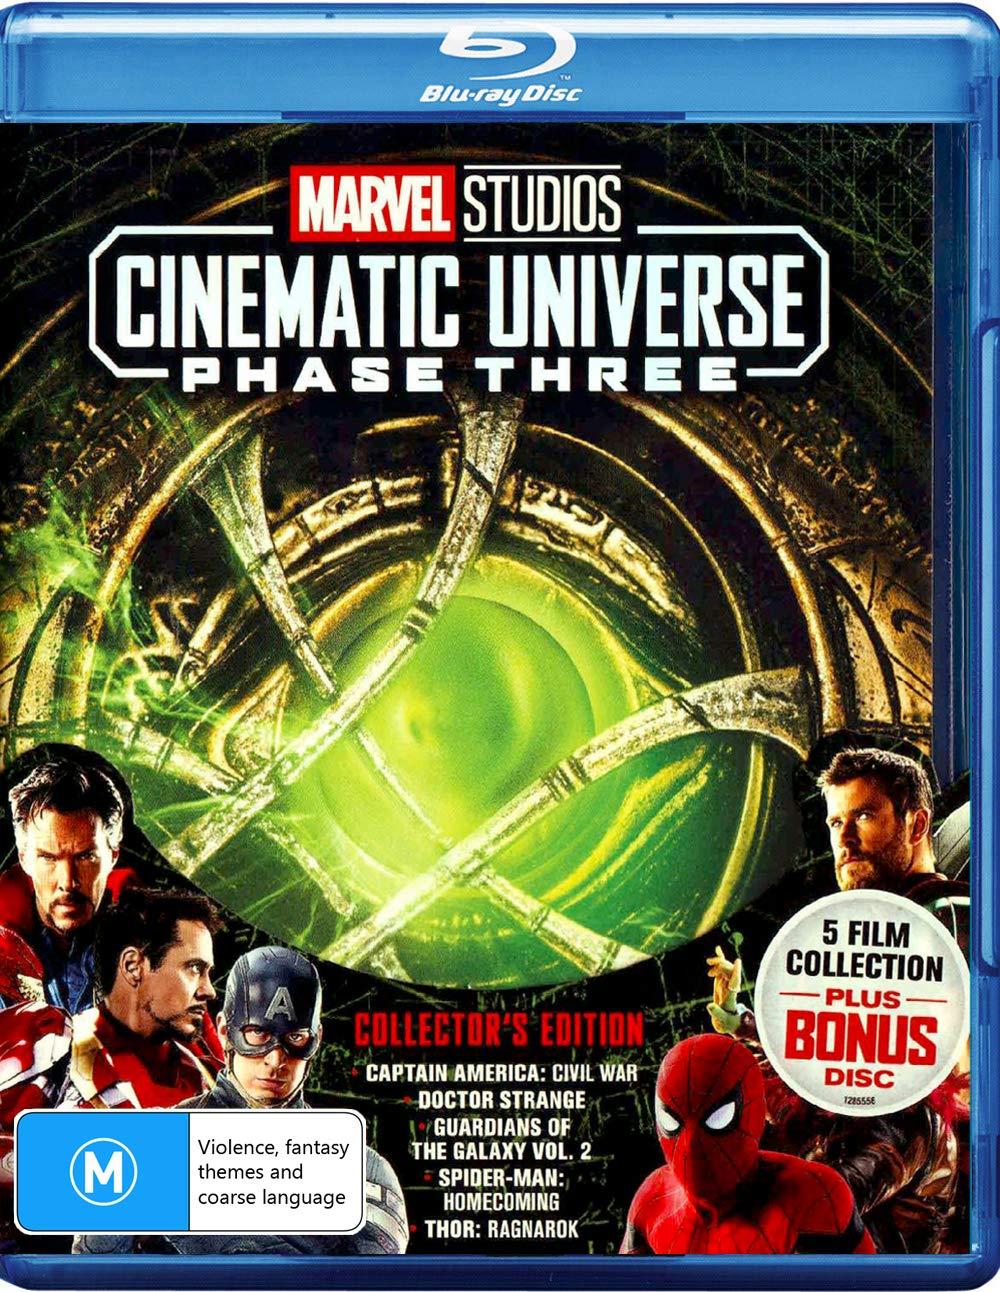 Marvel Phase 3: Part 1 (Captain America: Civil War / Doctor Strange / Guardians of the Galaxy: Volume 2 / Spider-Man: Homecoming / Thor: Ragnarok)